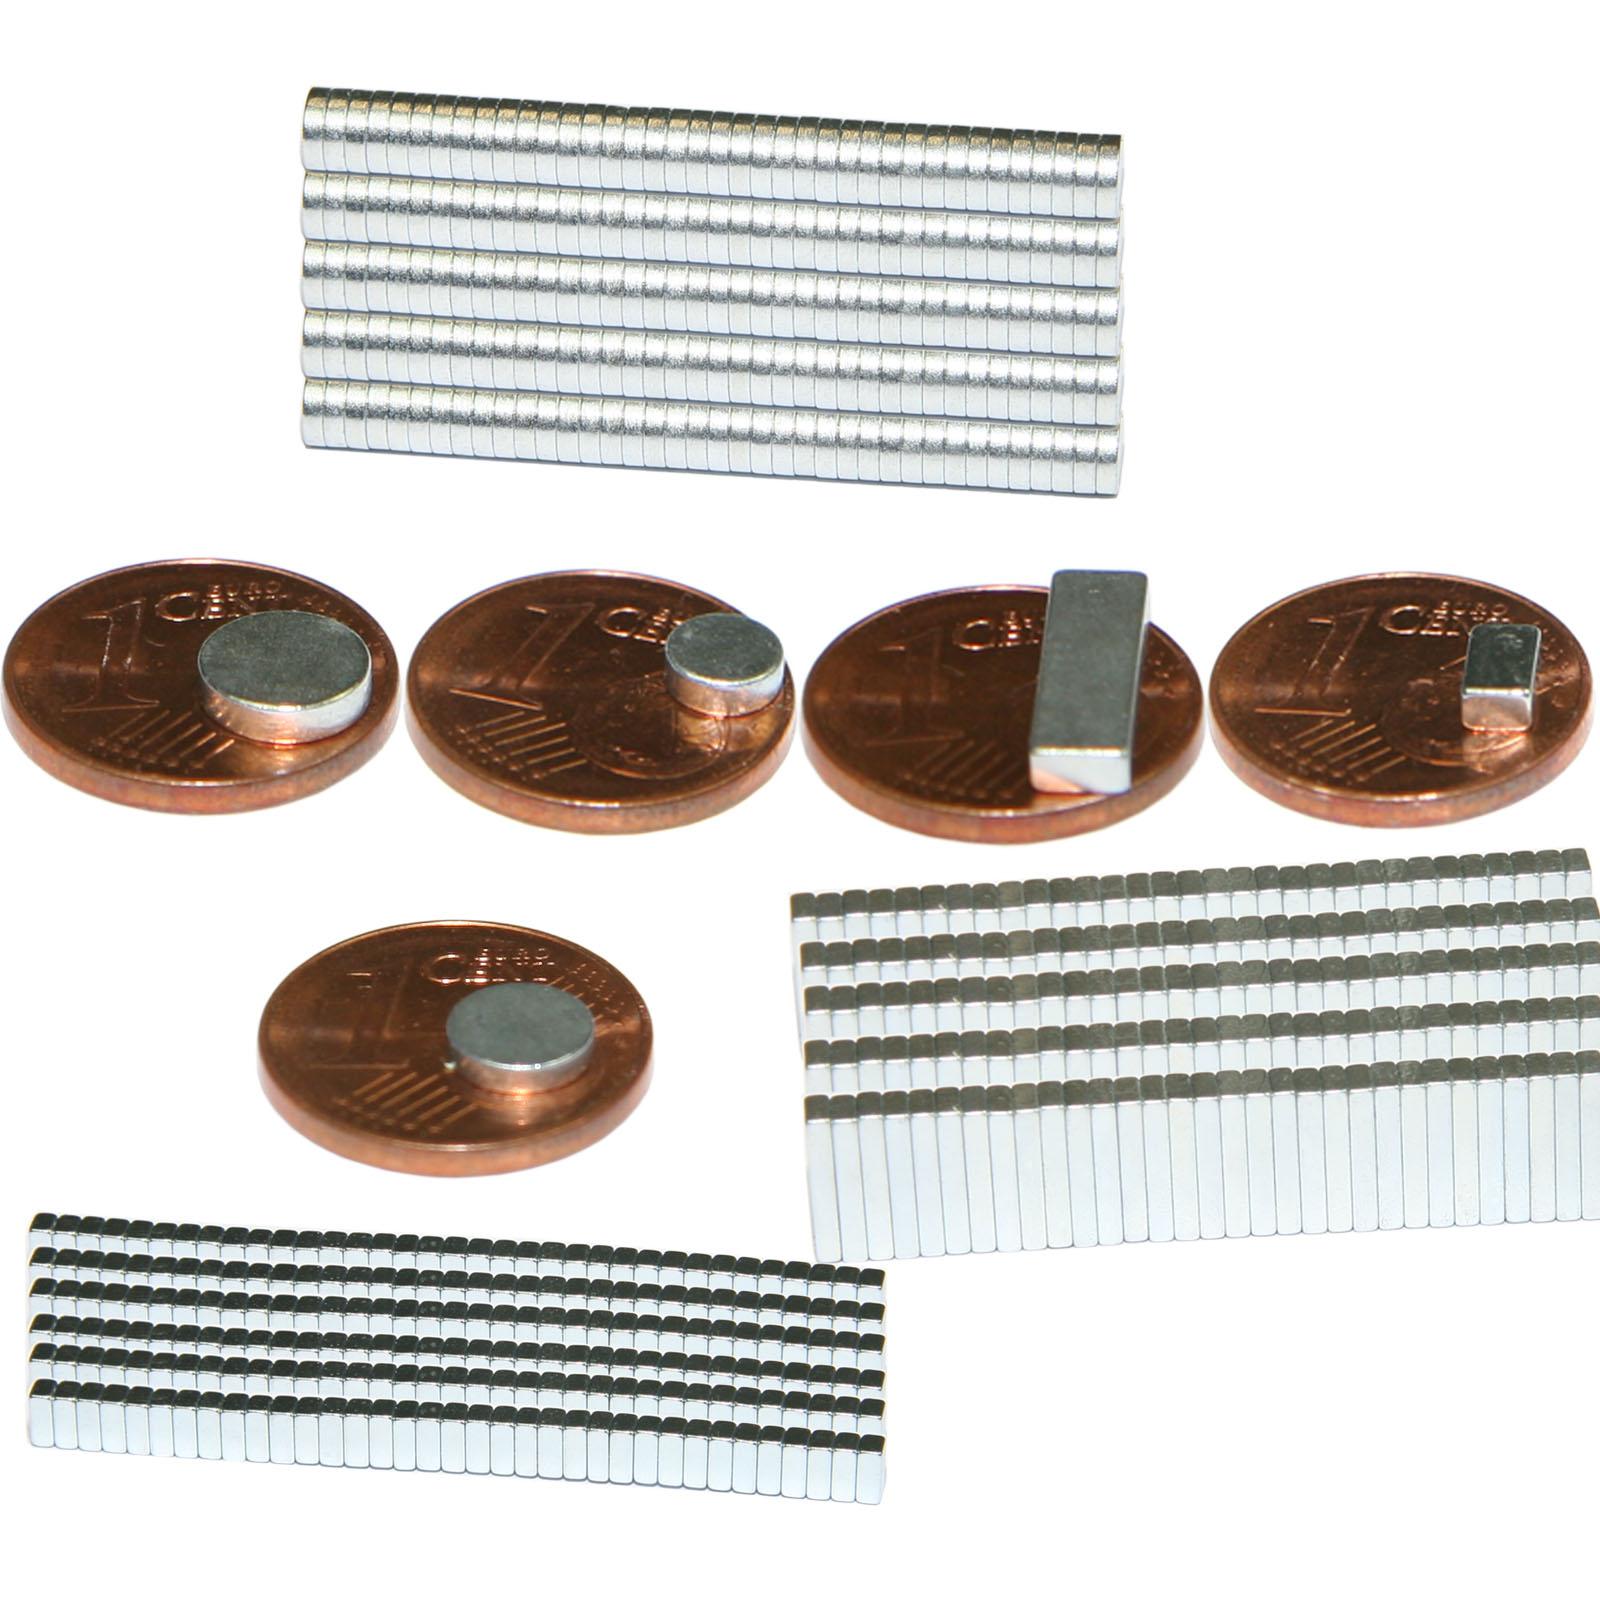 starke neodym magnete magnet minimagnete scheibe 5x2 mm ebay. Black Bedroom Furniture Sets. Home Design Ideas